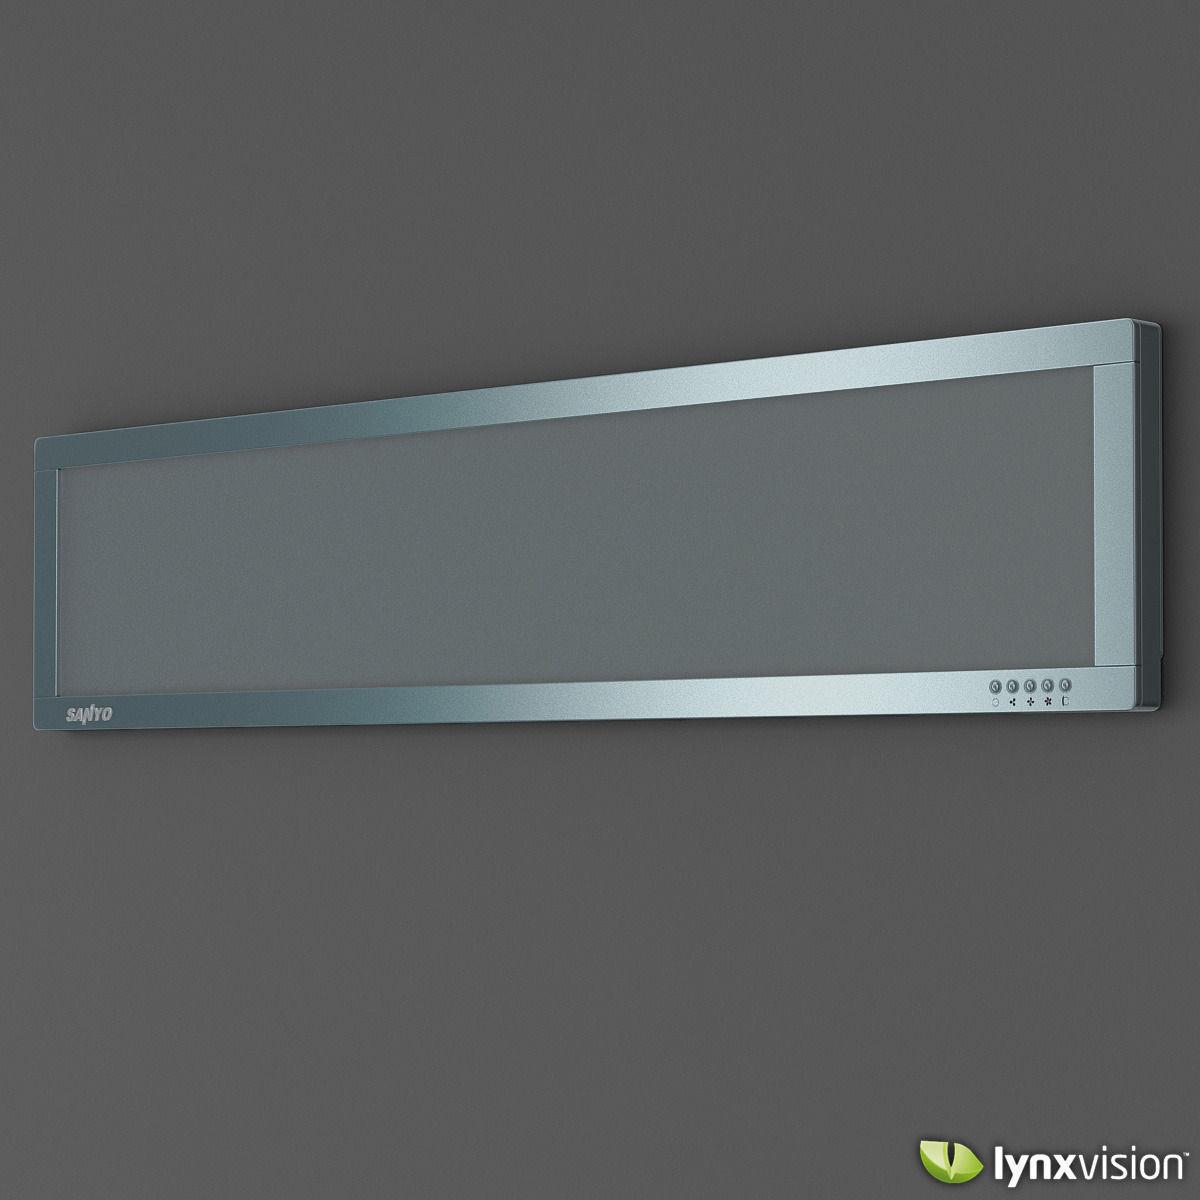 Sanyo Slim Air Conditioner 3d Cgtrader